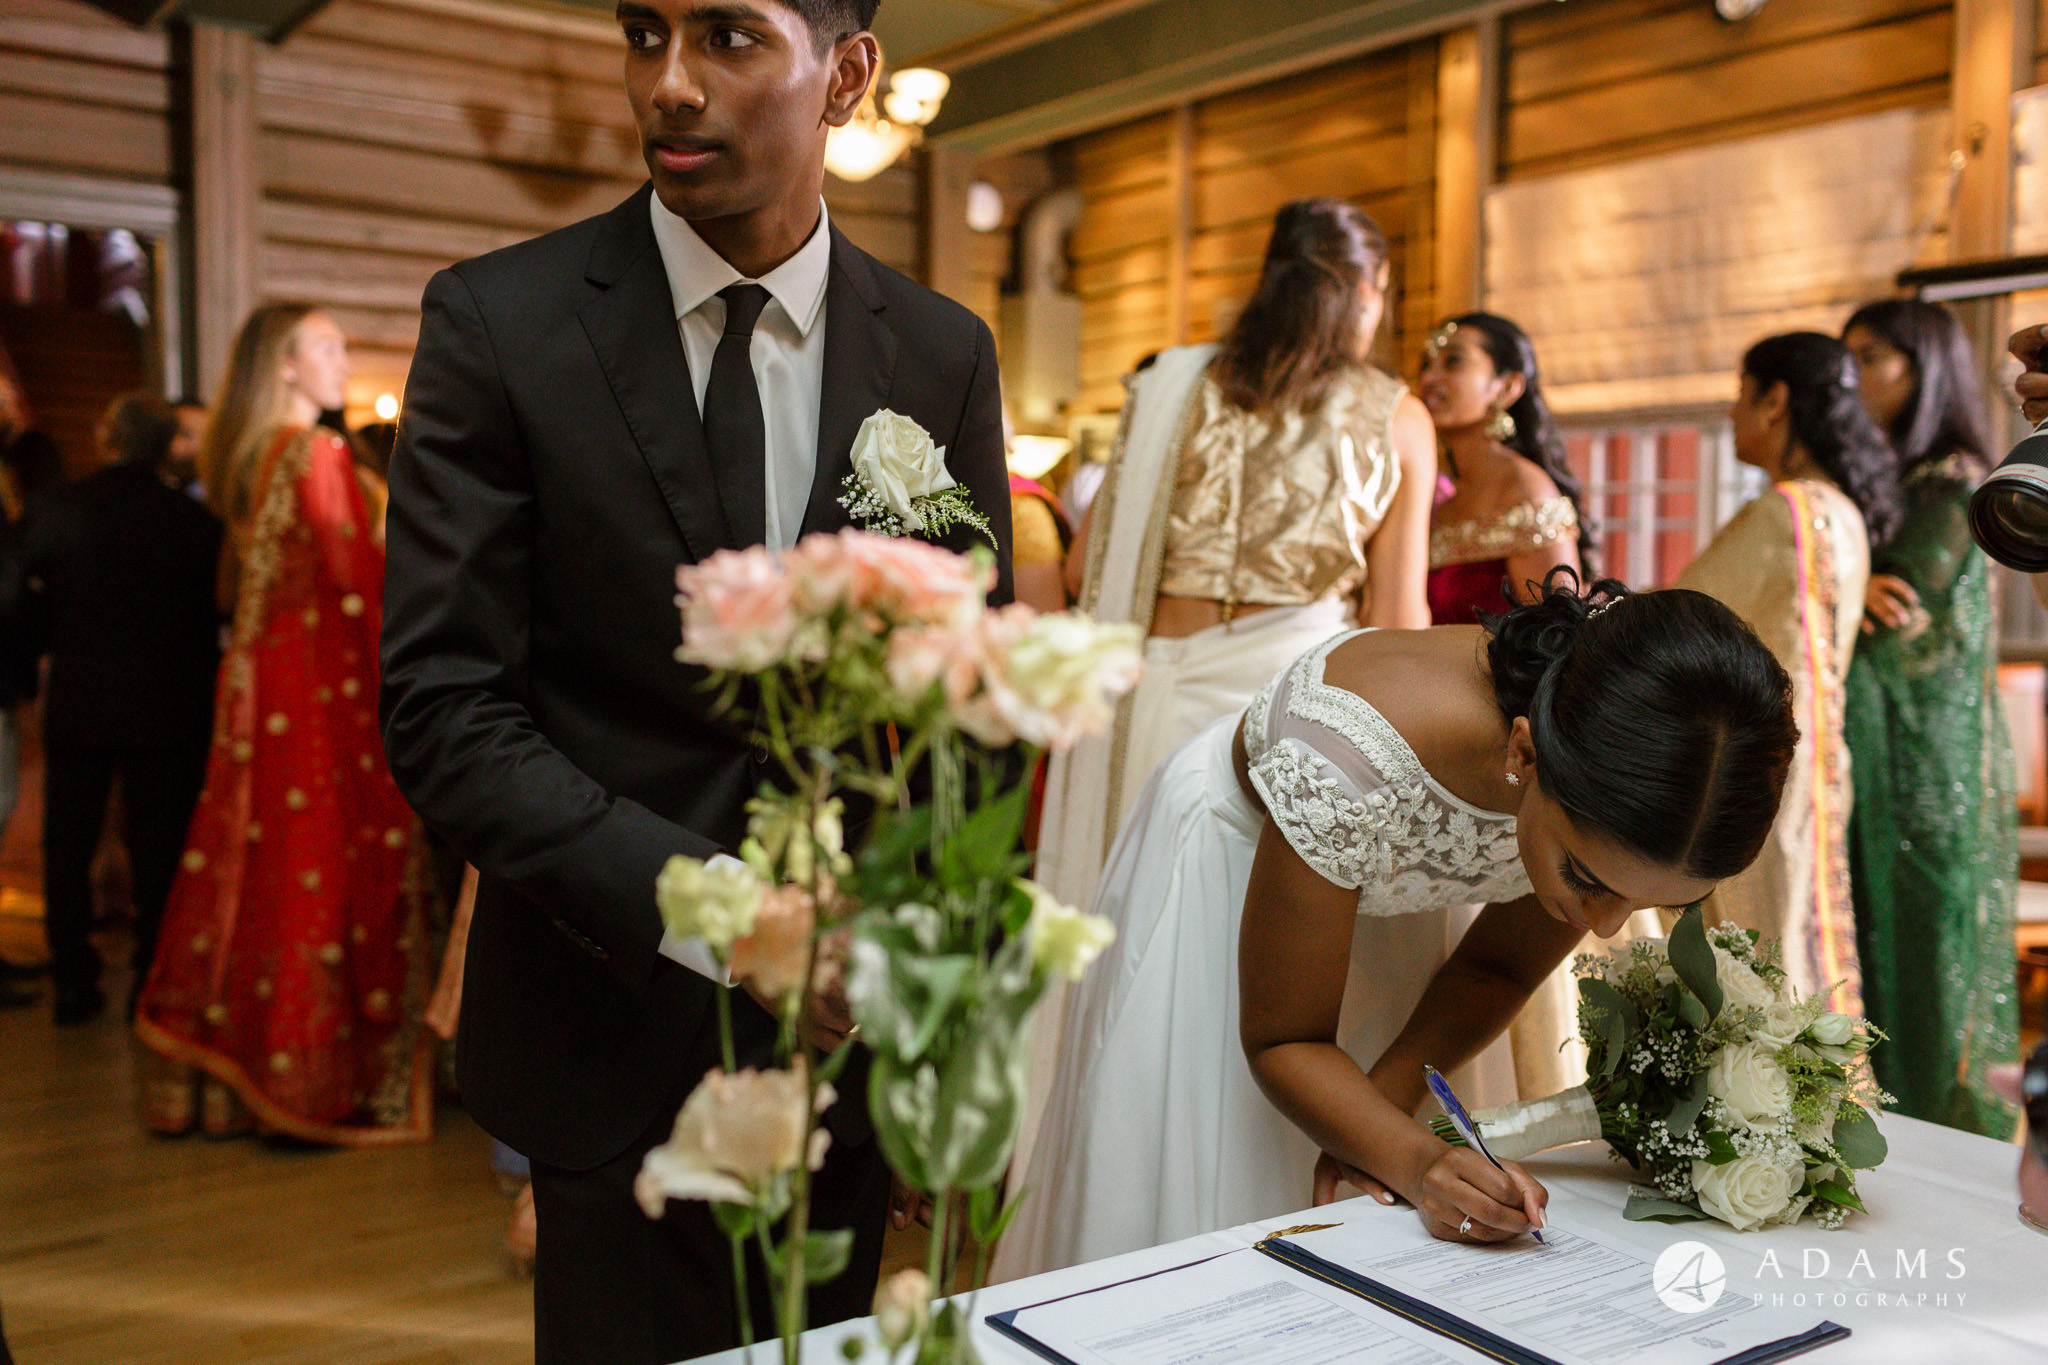 Oslo Wedding Photography couple signing the registrar